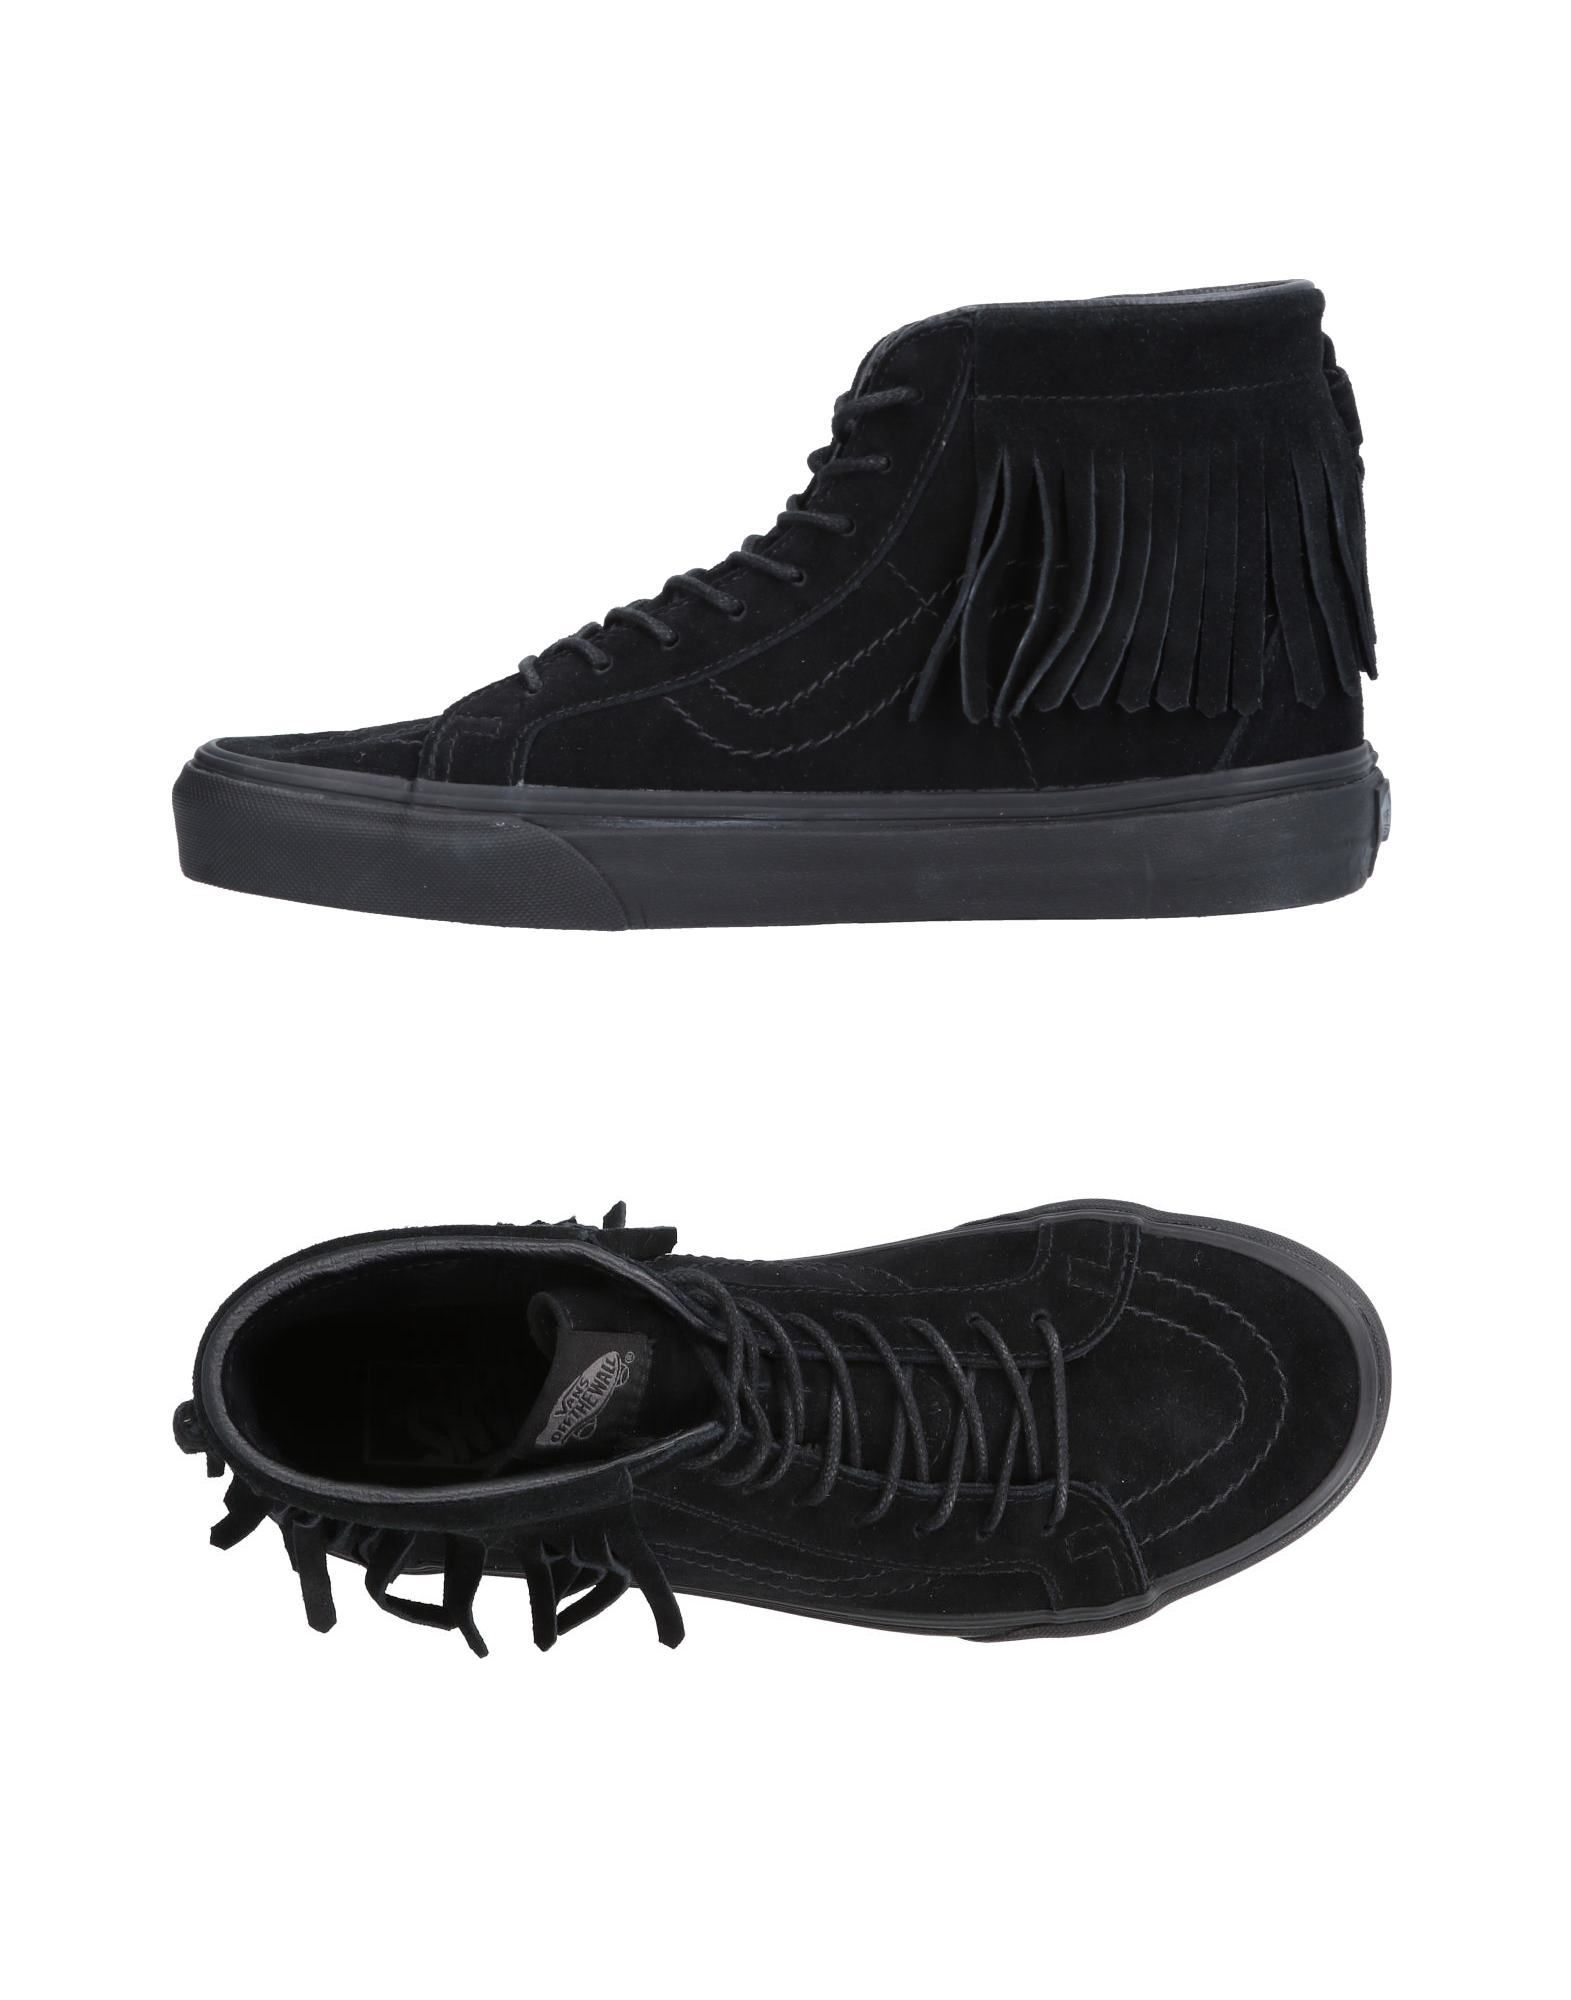 Moda Sneakers Vans Uomo - 11497679HO